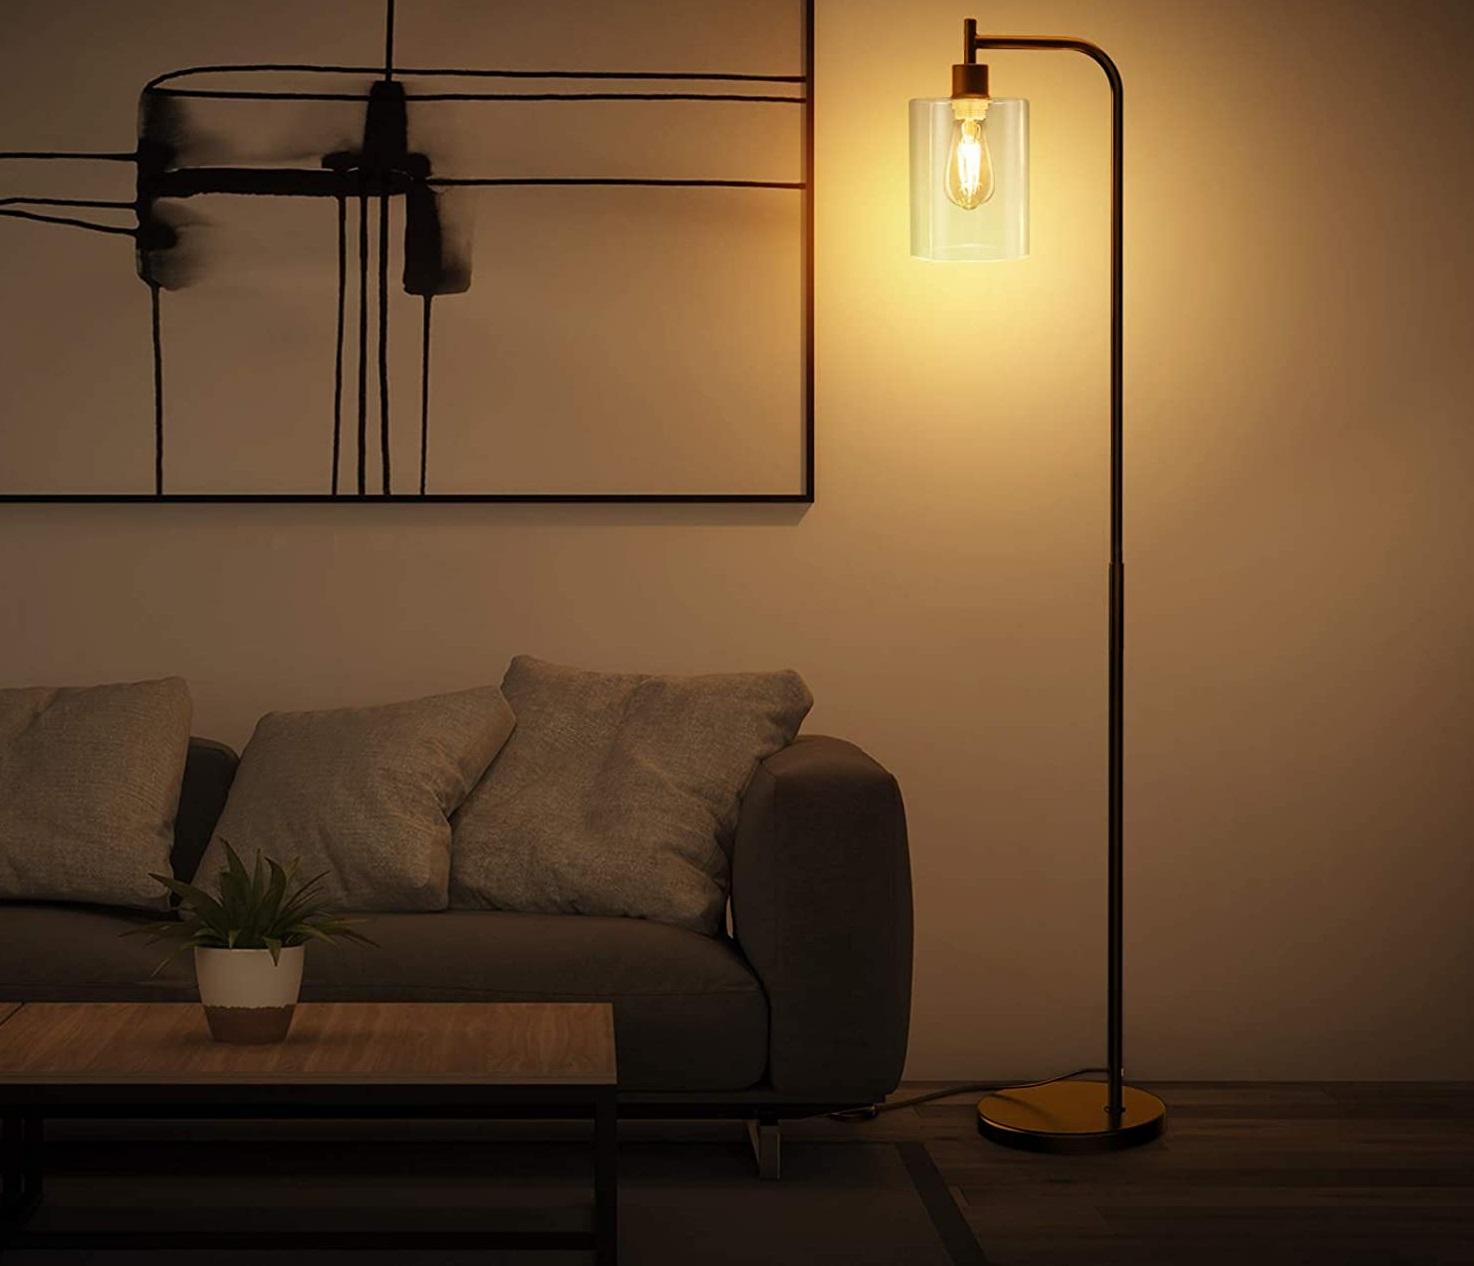 Add-LED-Floor-Lamp. 10 Unique Floor Lamps to Brighten Your Living Room